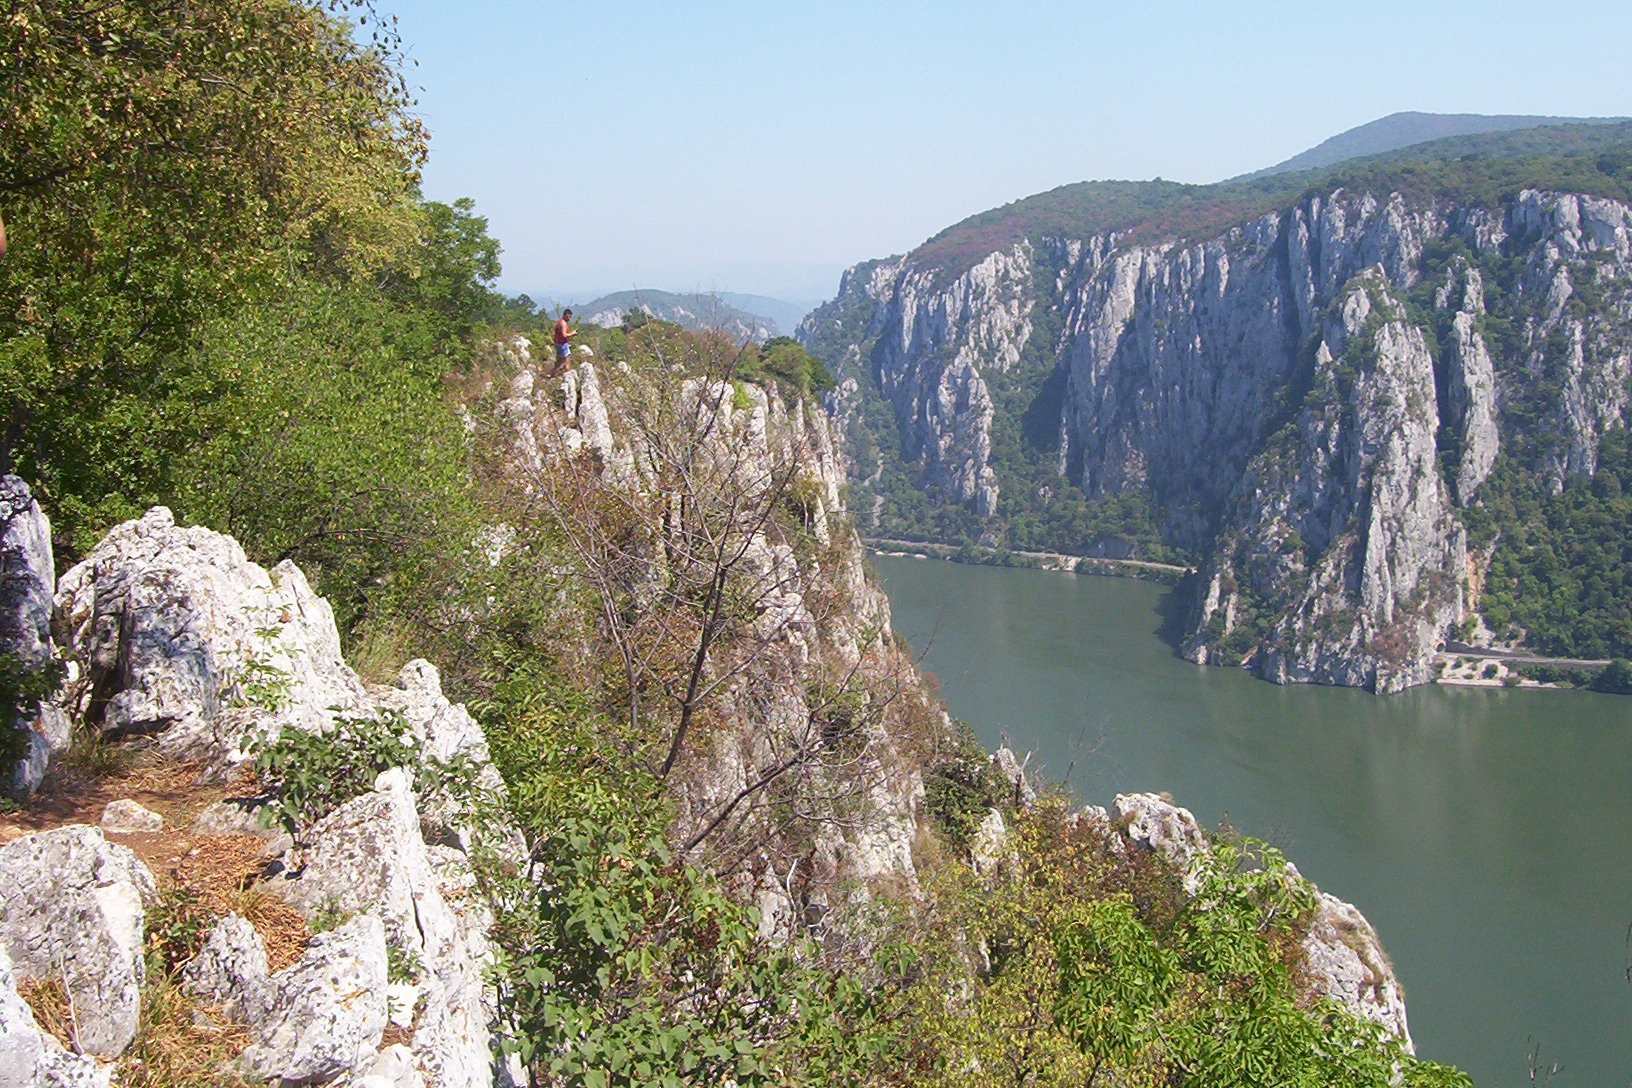 29 Iunie – Ziua Internationala a Dunării